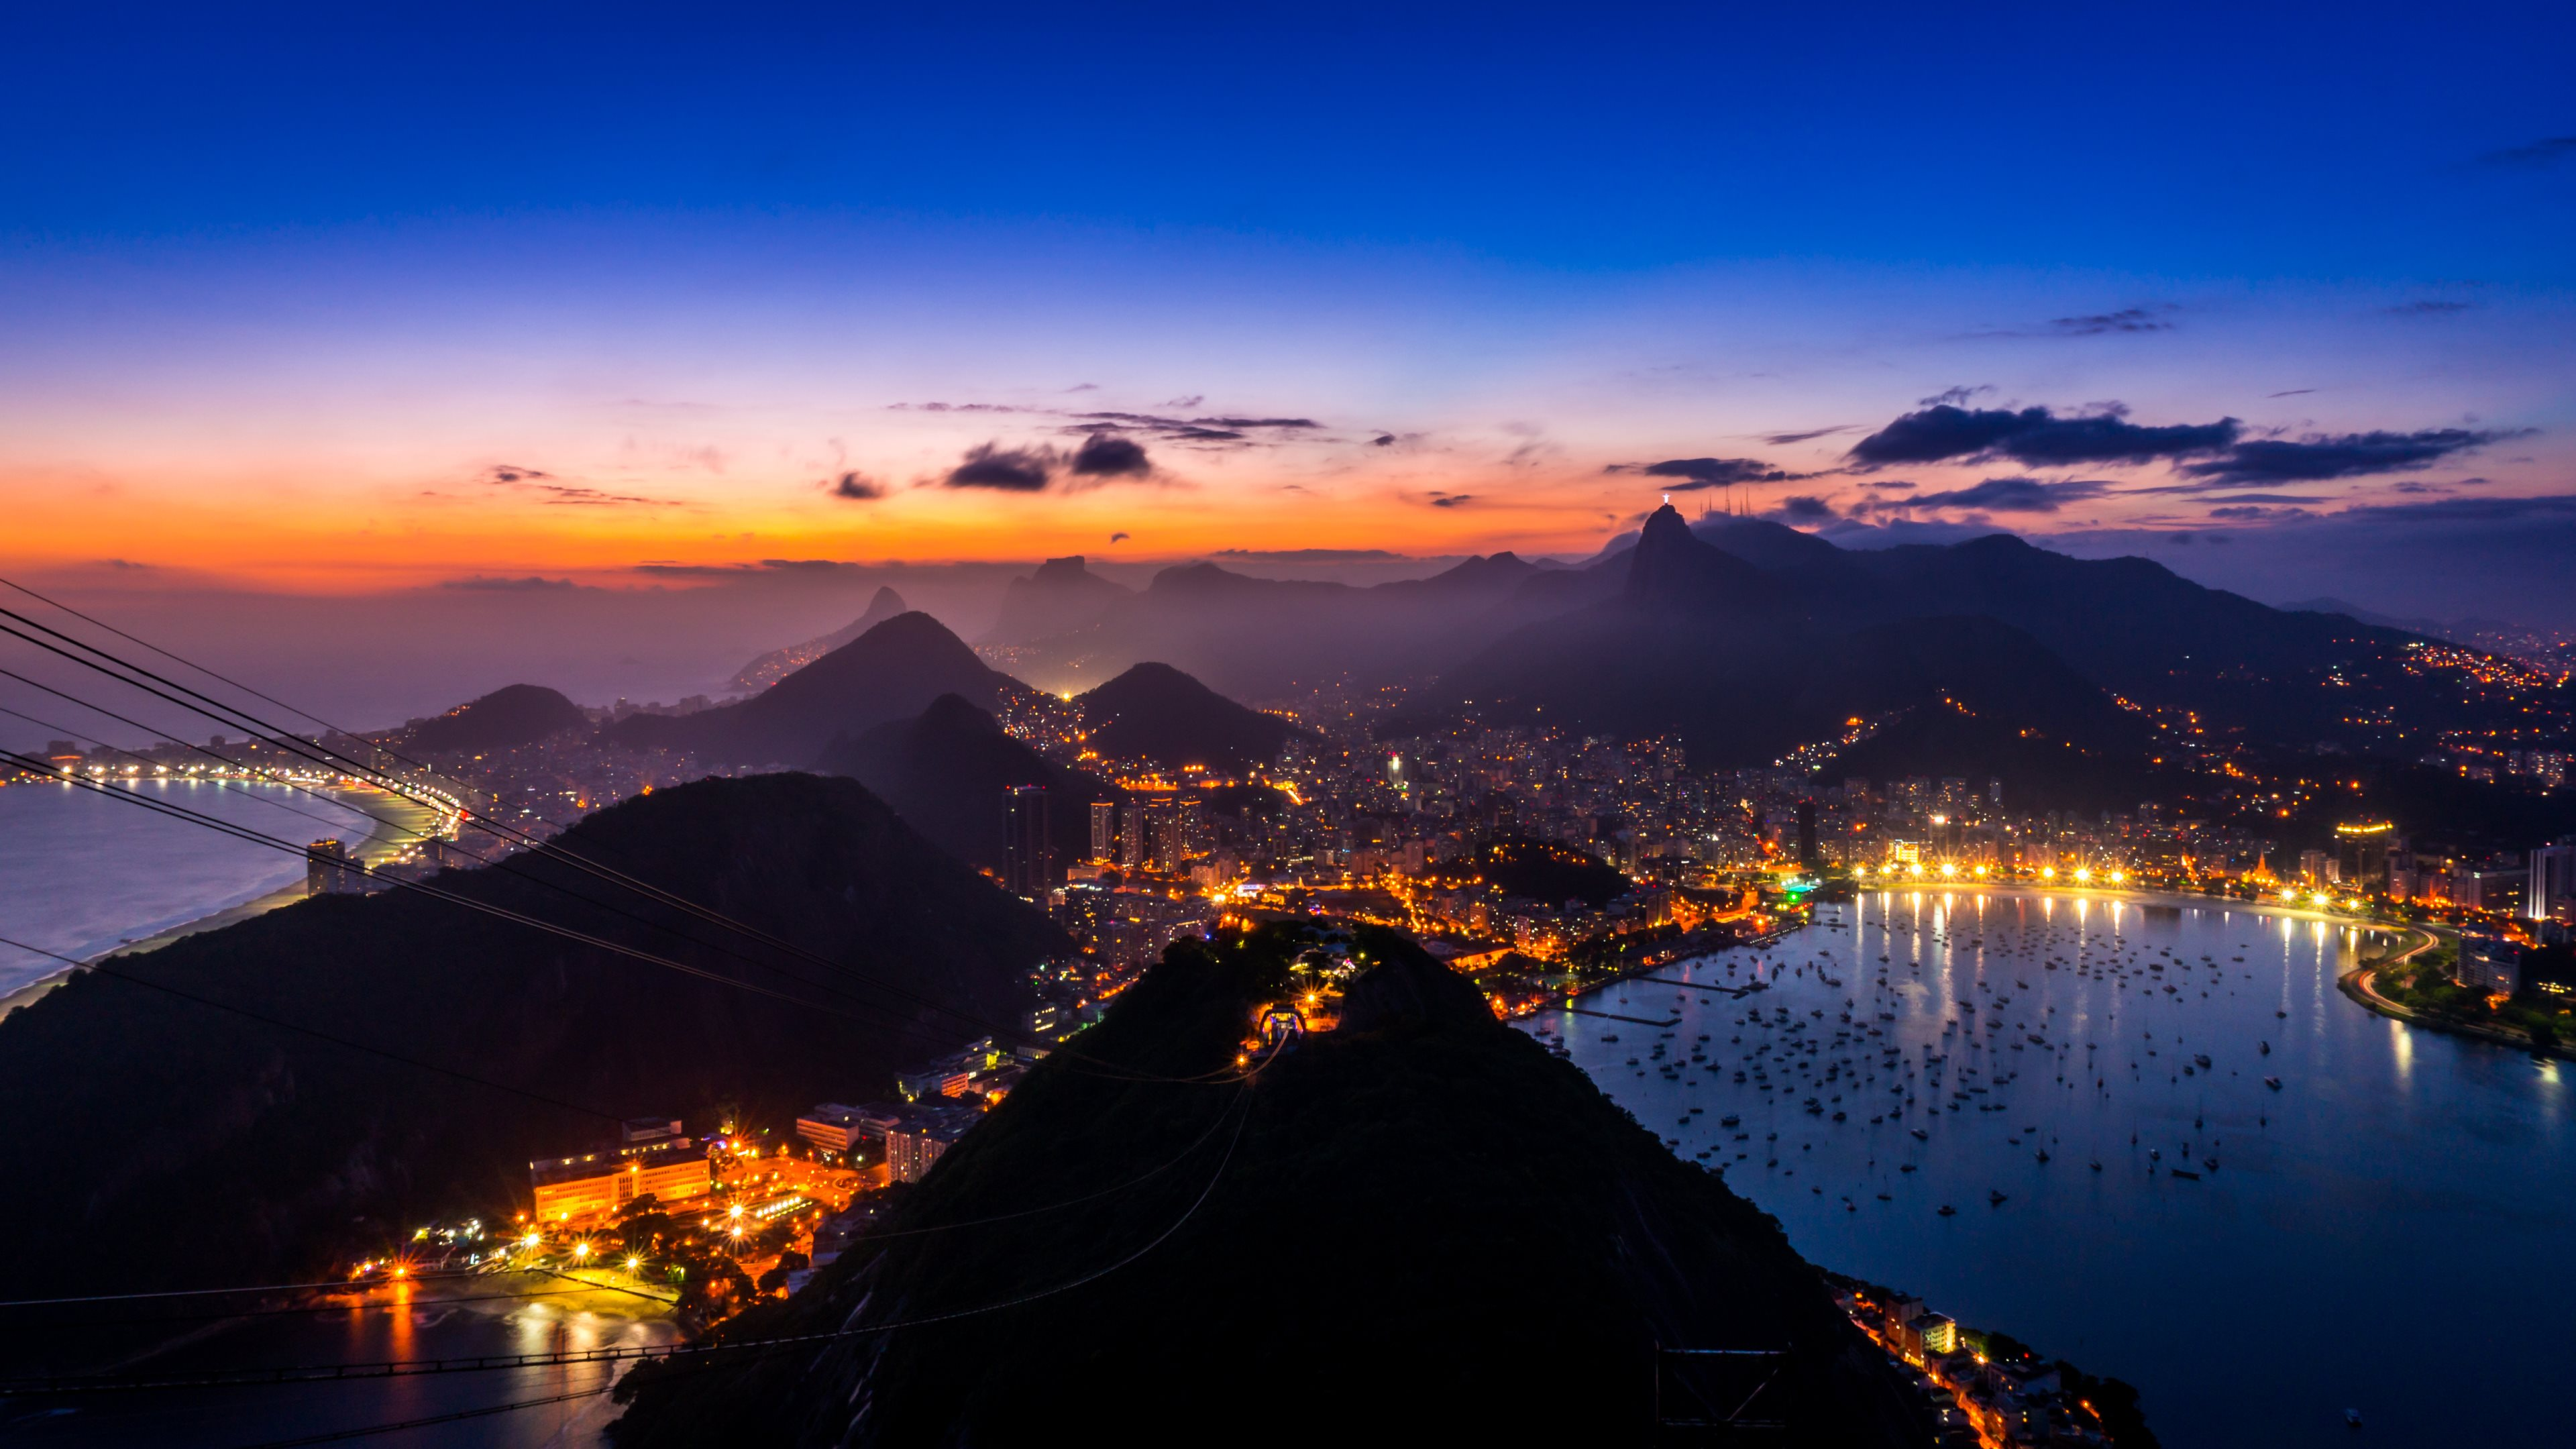 41 Rio De Janeiro Wallpaper Hd On Wallpapersafari